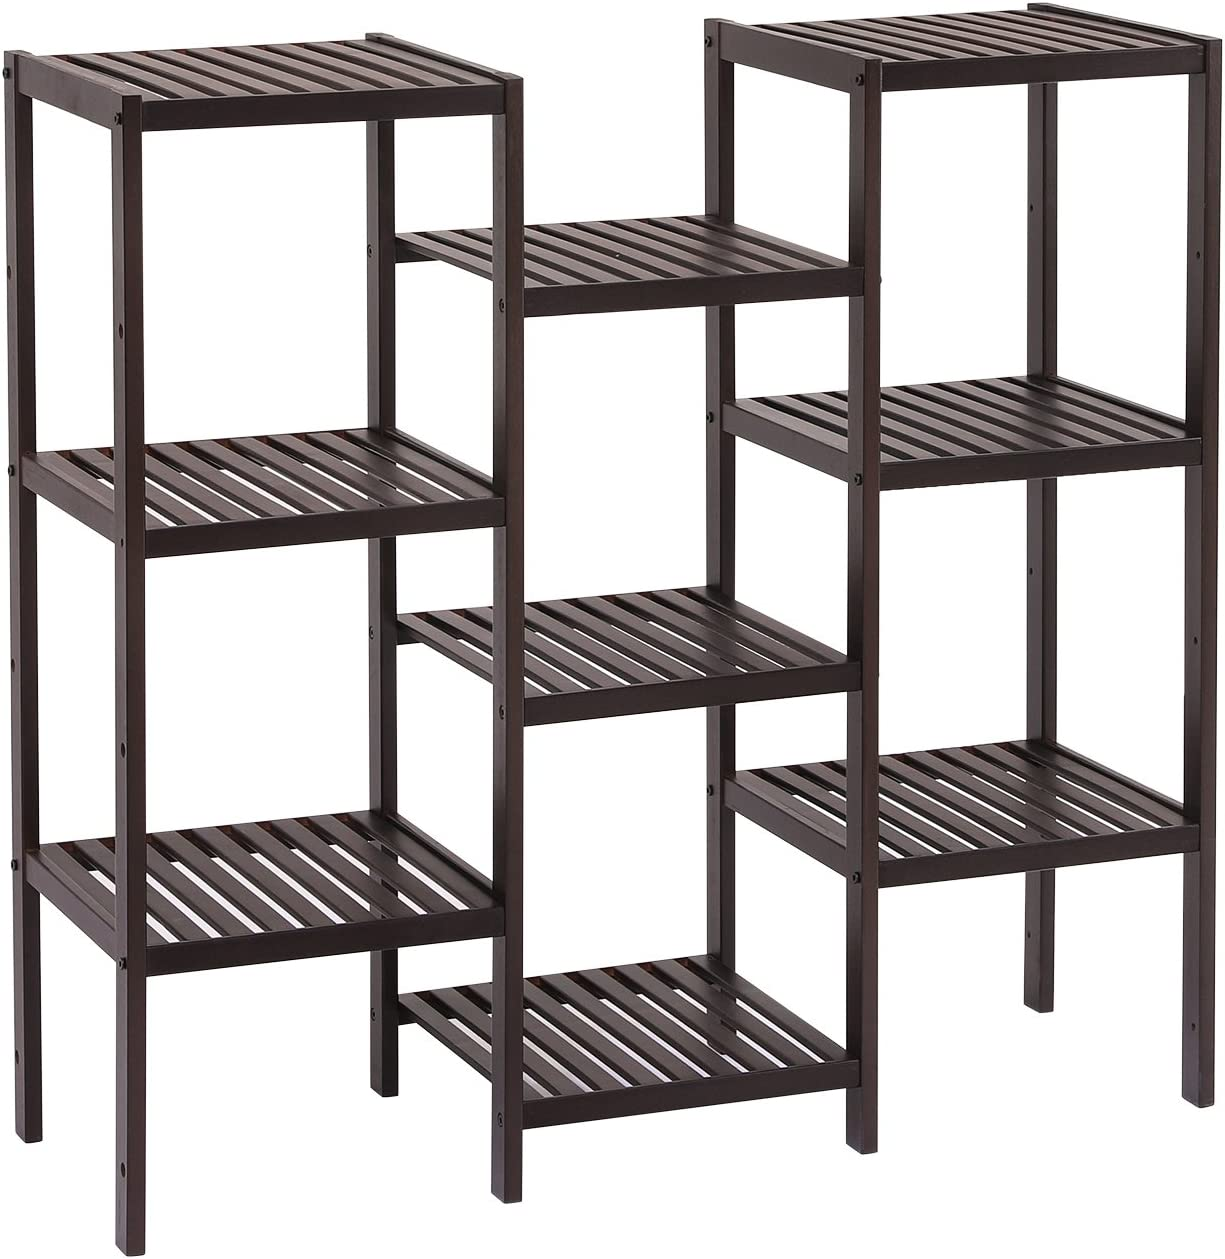 5 Shelves 1 Cabinet White Shoe Storage Rack Organizer Stand Slim Shelf Display